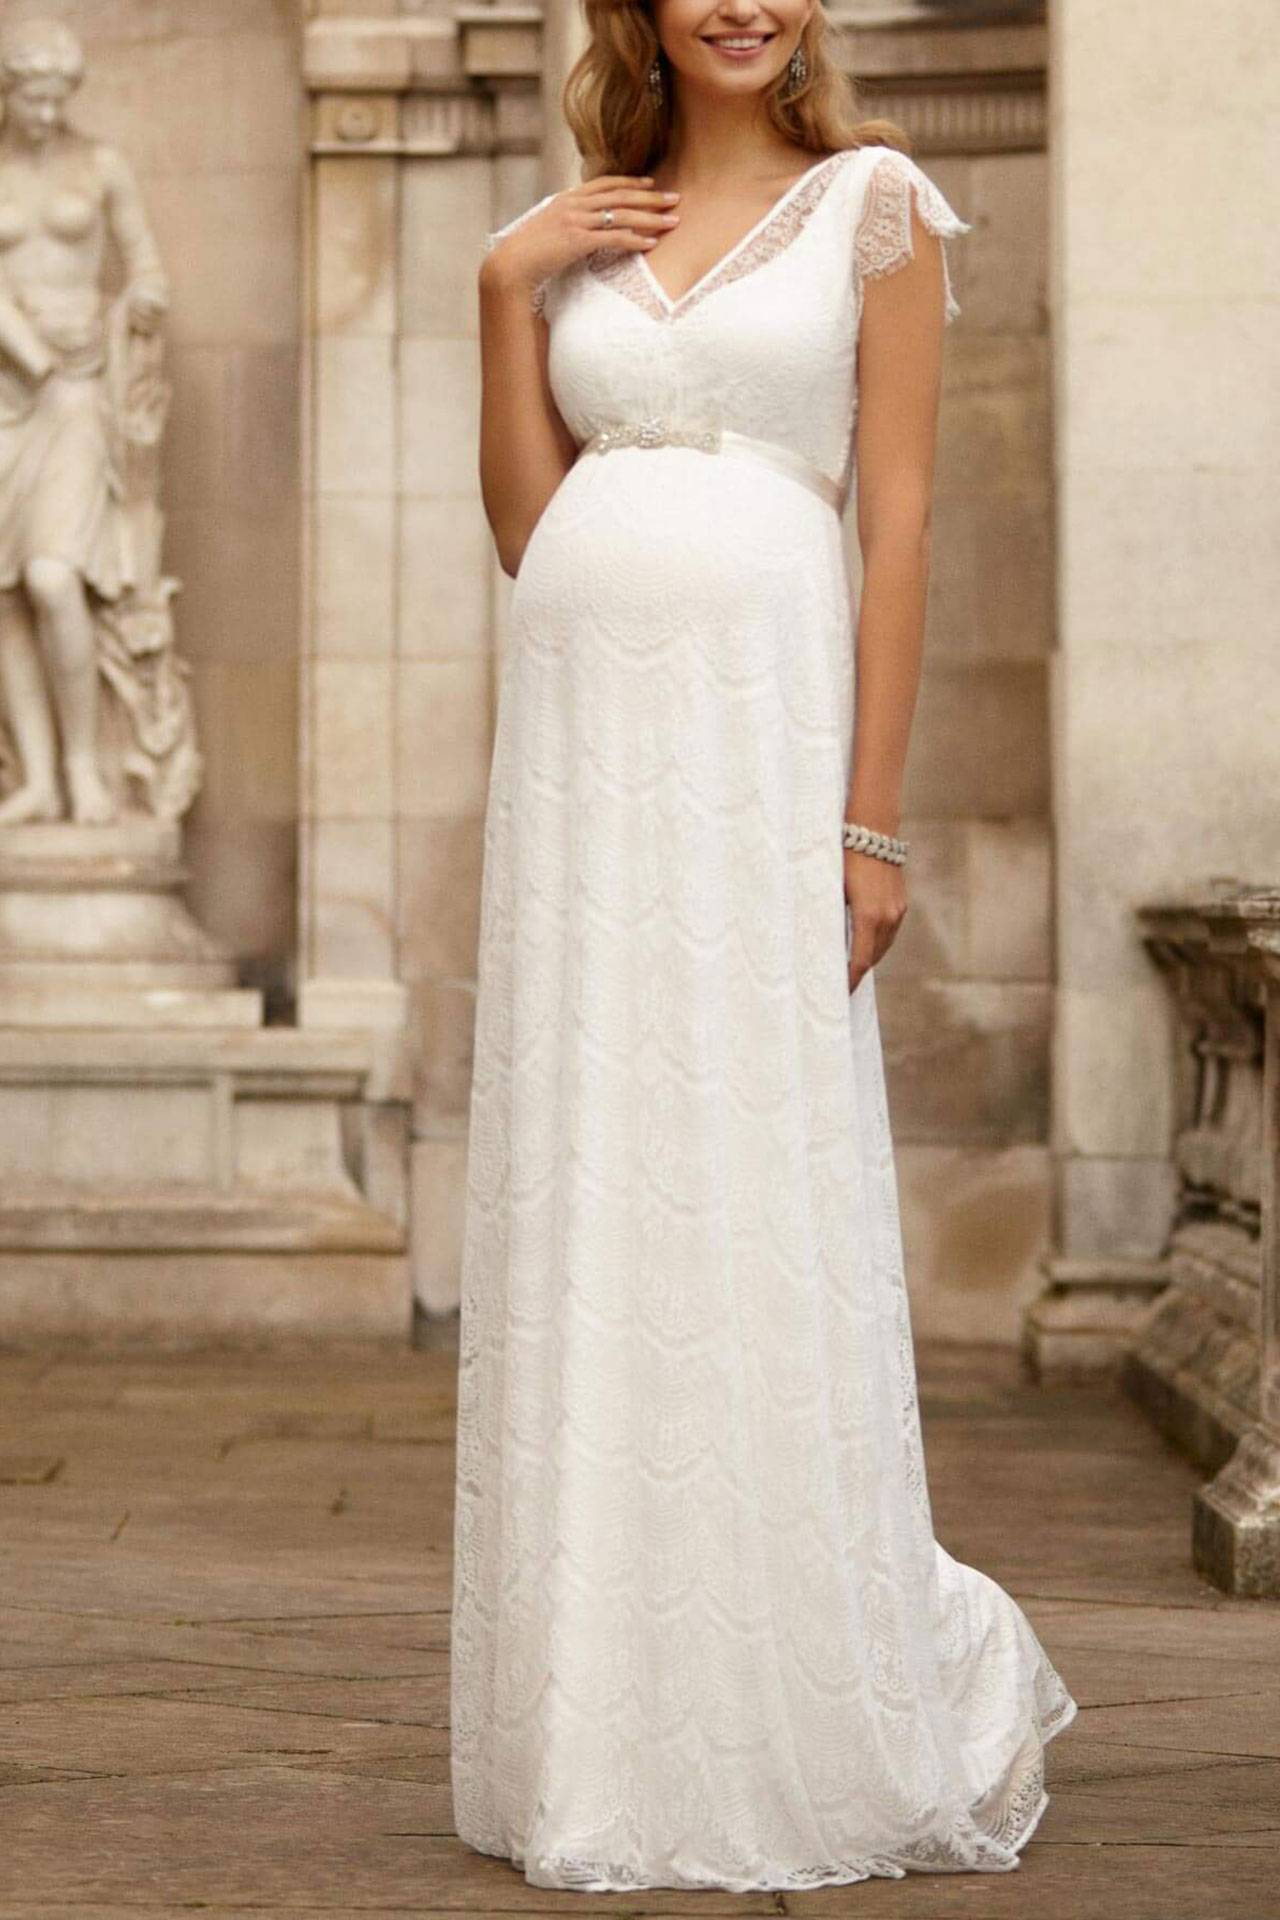 20 Maternity Wedding Dresses Beautiful Maternity Bridal Gowns ...